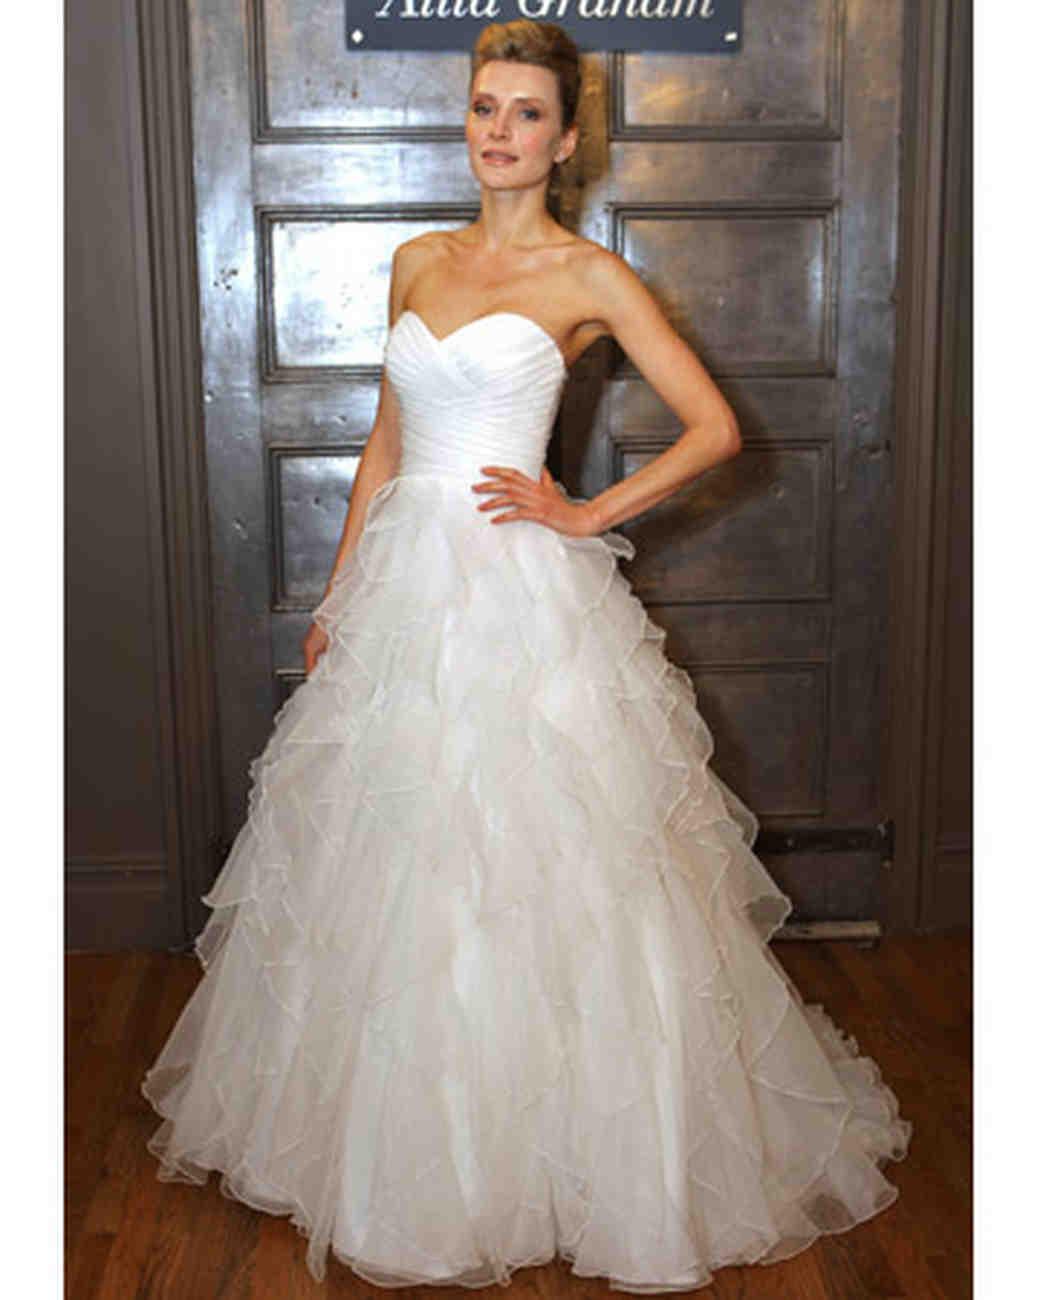 Alita Graham Wedding Dresses – Fashion dresses